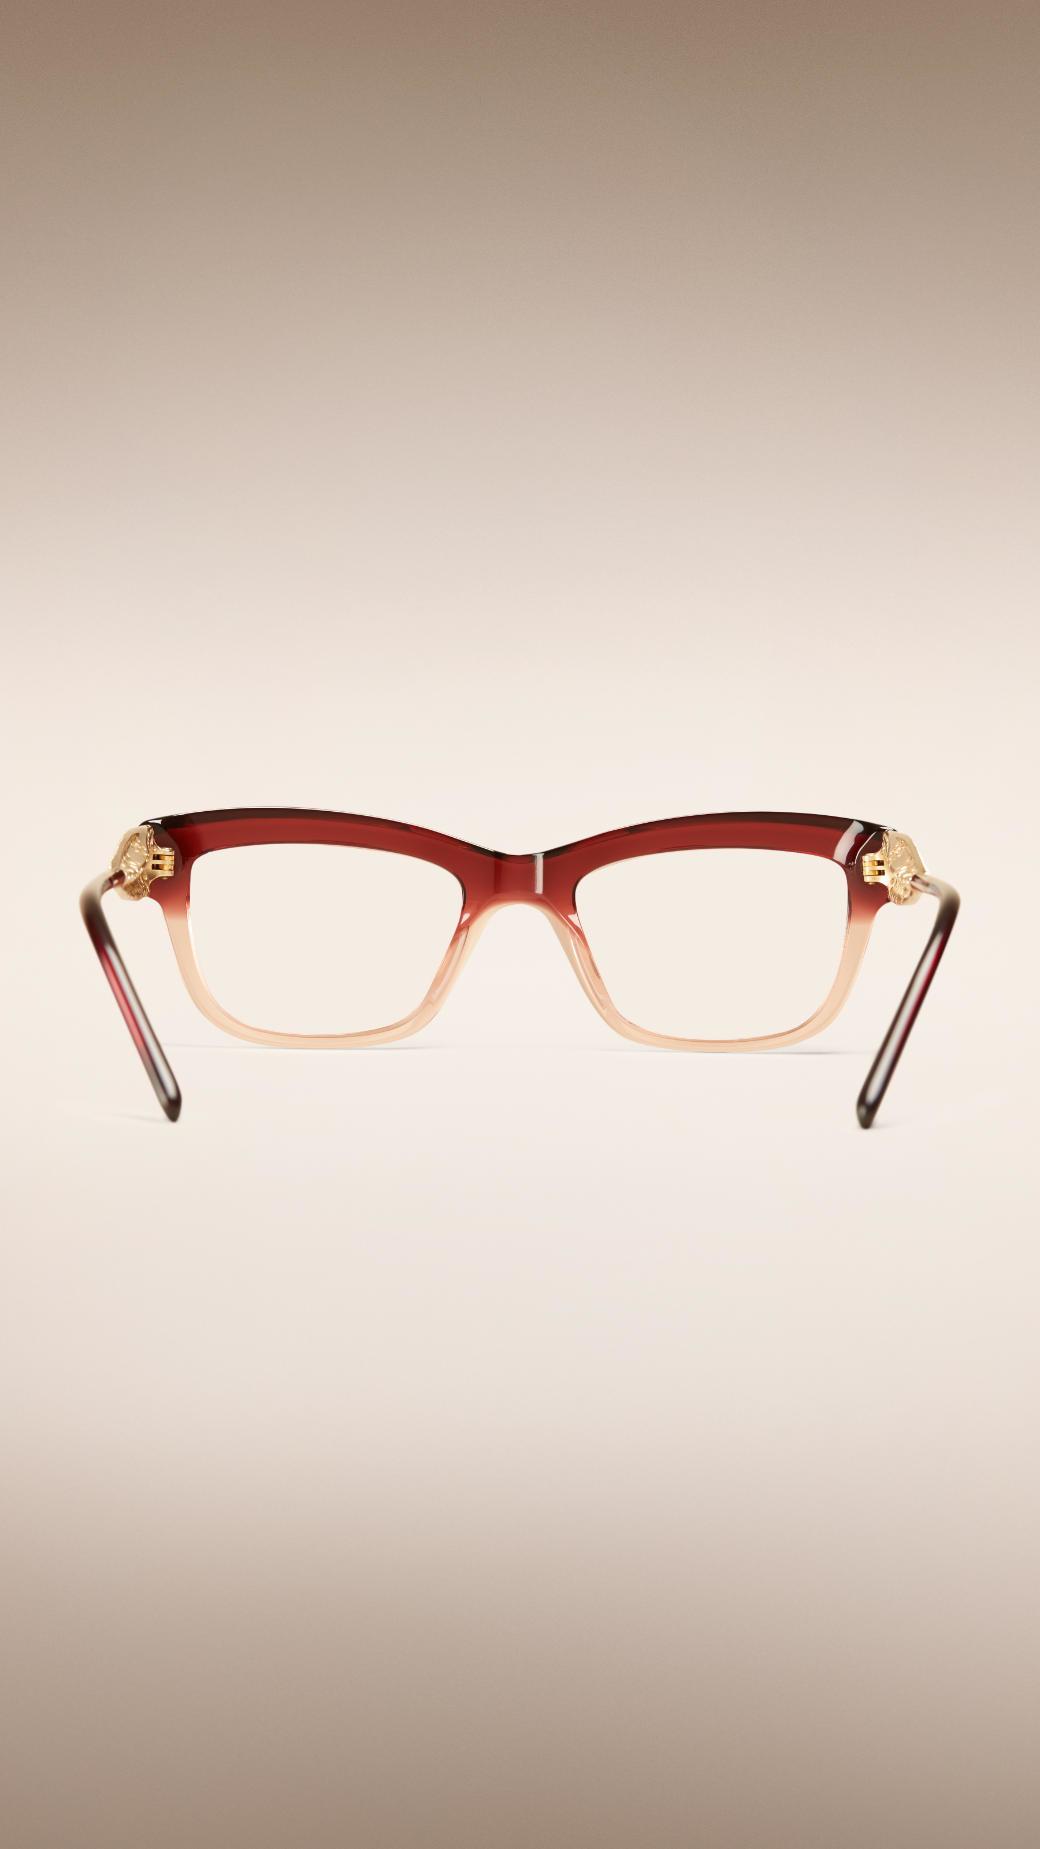 9f922b9e3f Burberry Gabardine Lace Collection Cat-eye Optical Frames Dark ...